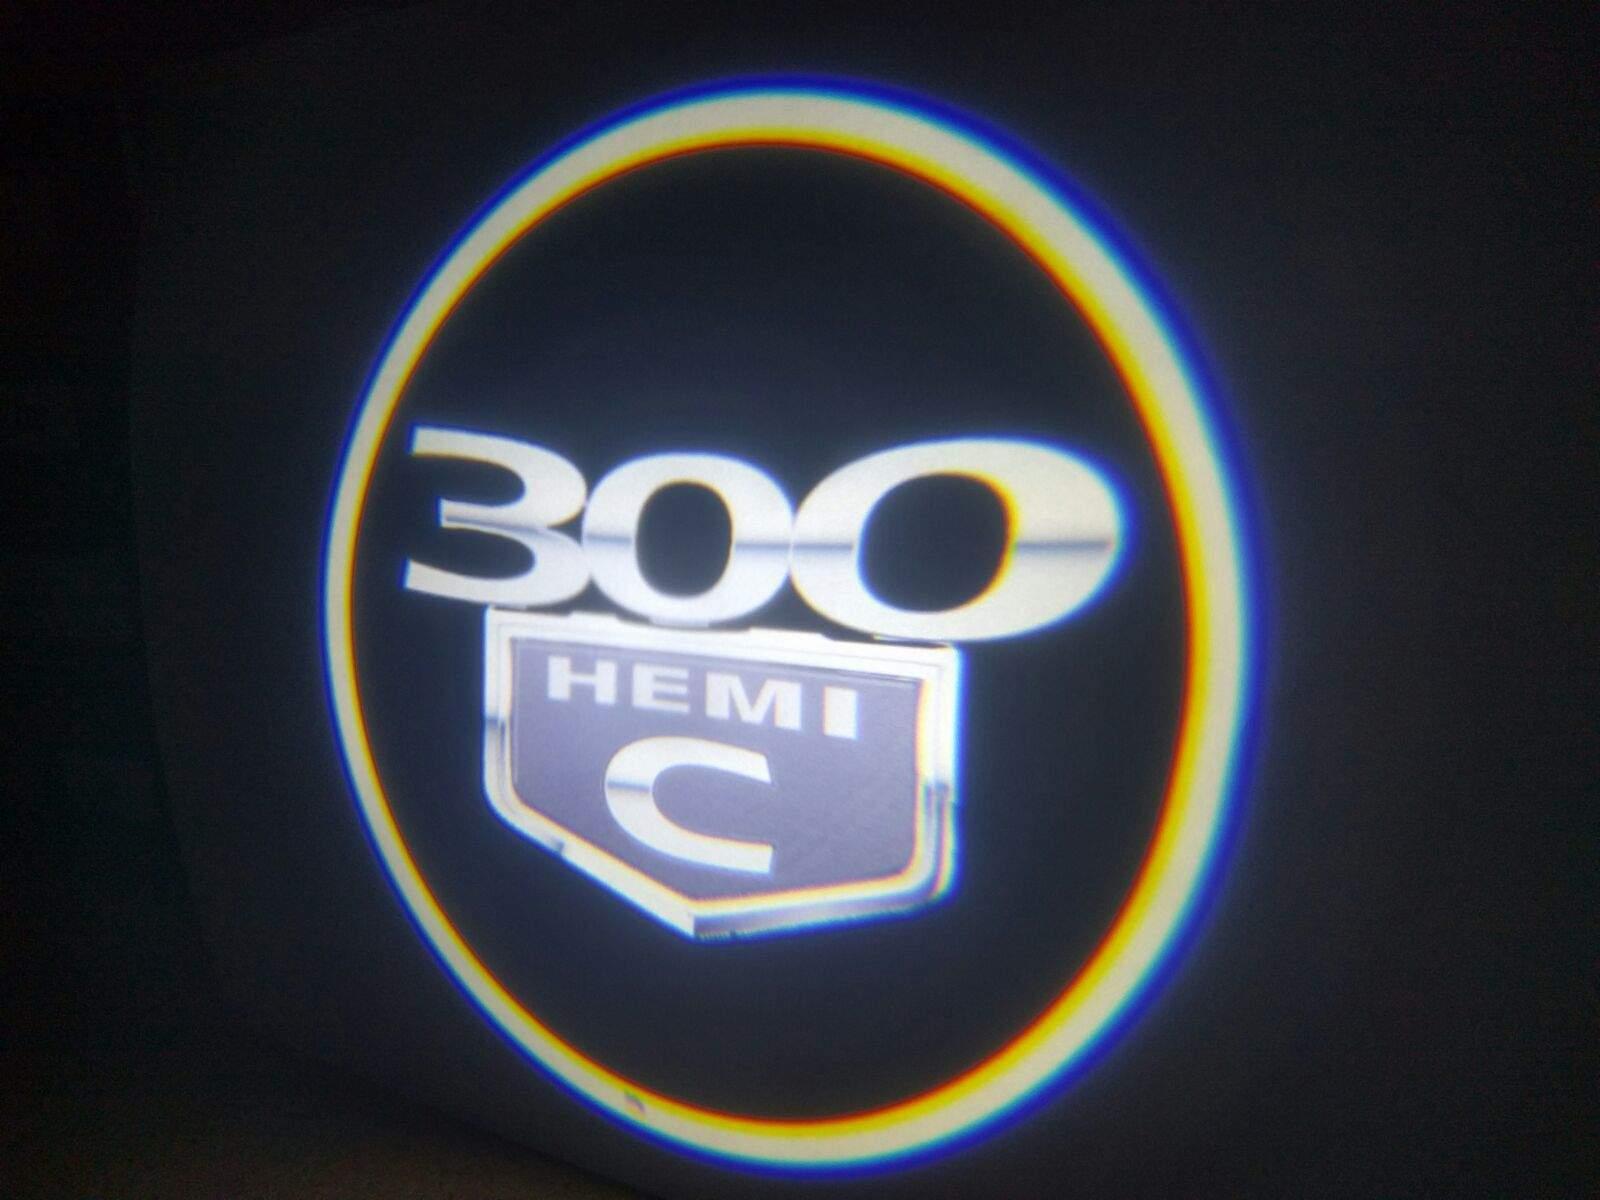 300 Hemi C LED Door Projector Courtesy Puddle Logo Light